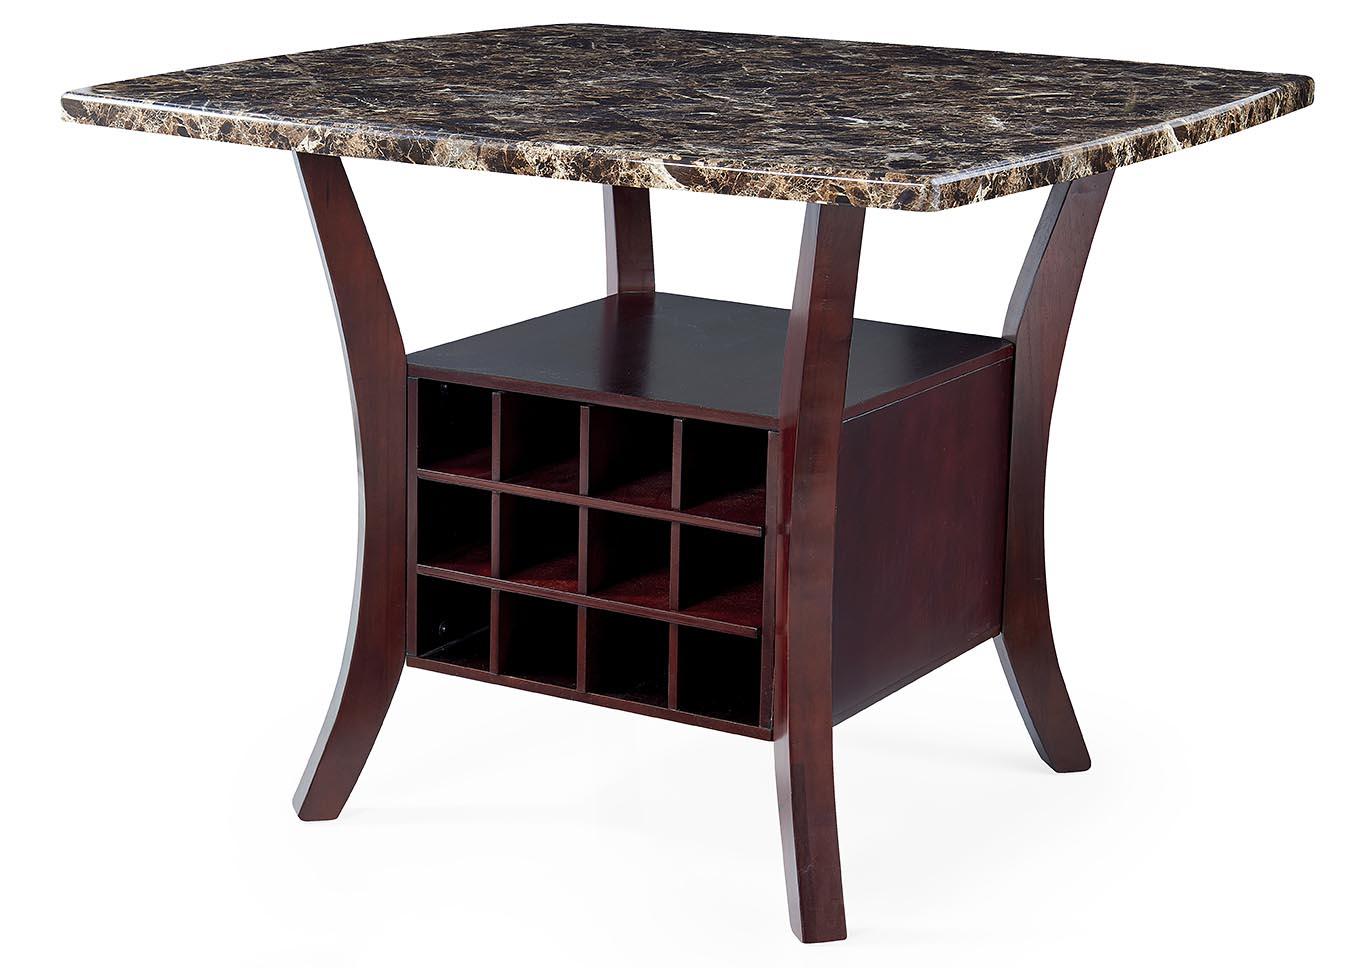 Wala Espresso Bar Table,Global Furniture USA